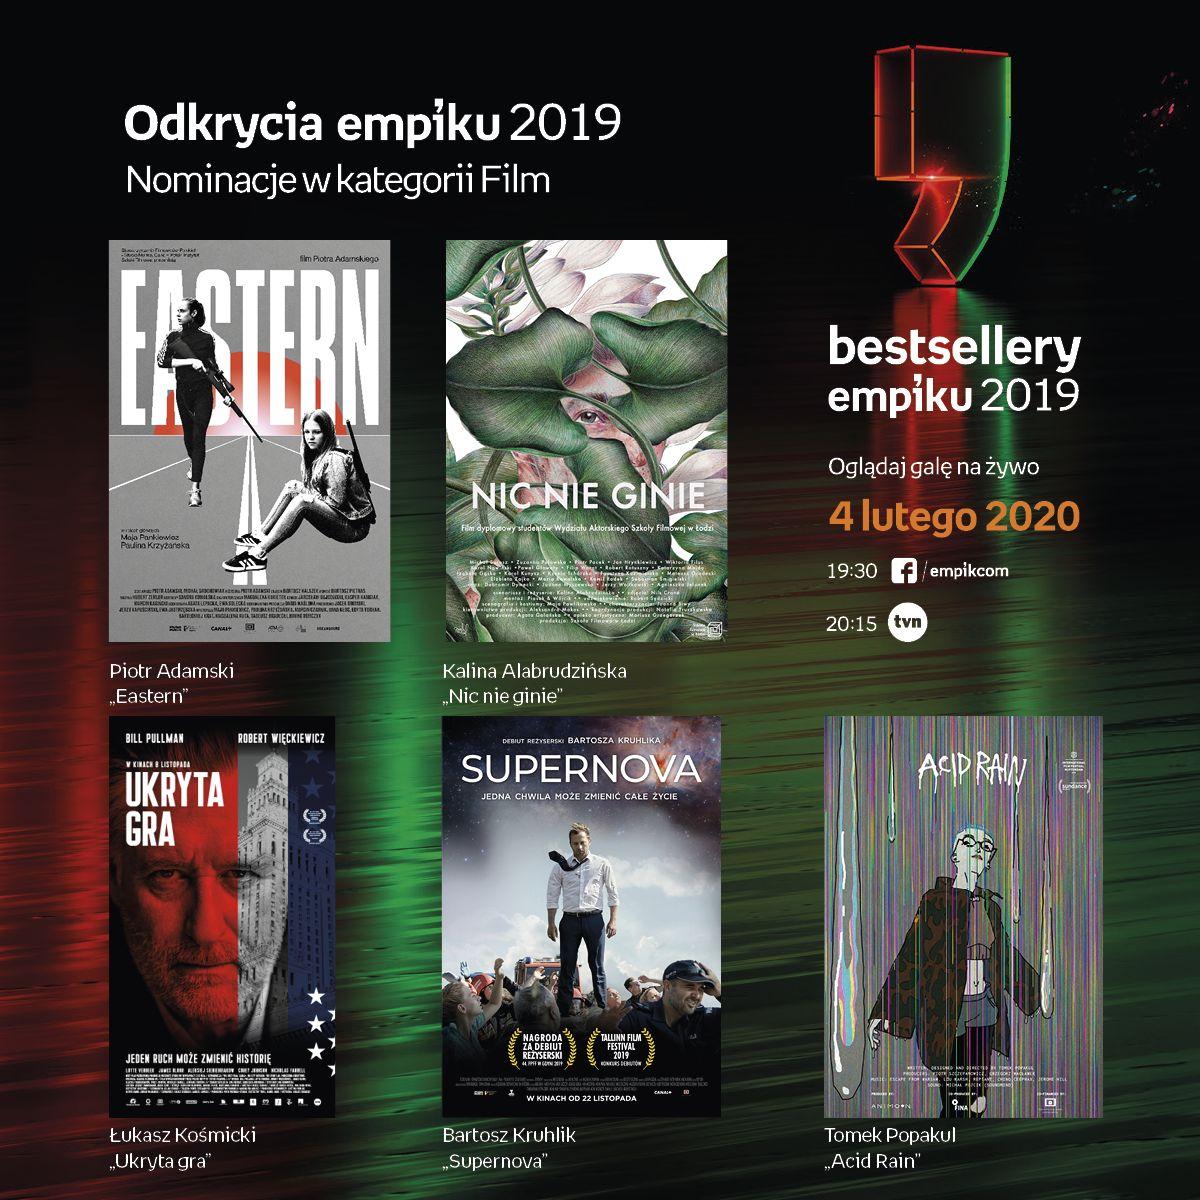 Bestsellery-Empiku-FIlm-nominacje-TOP5.png